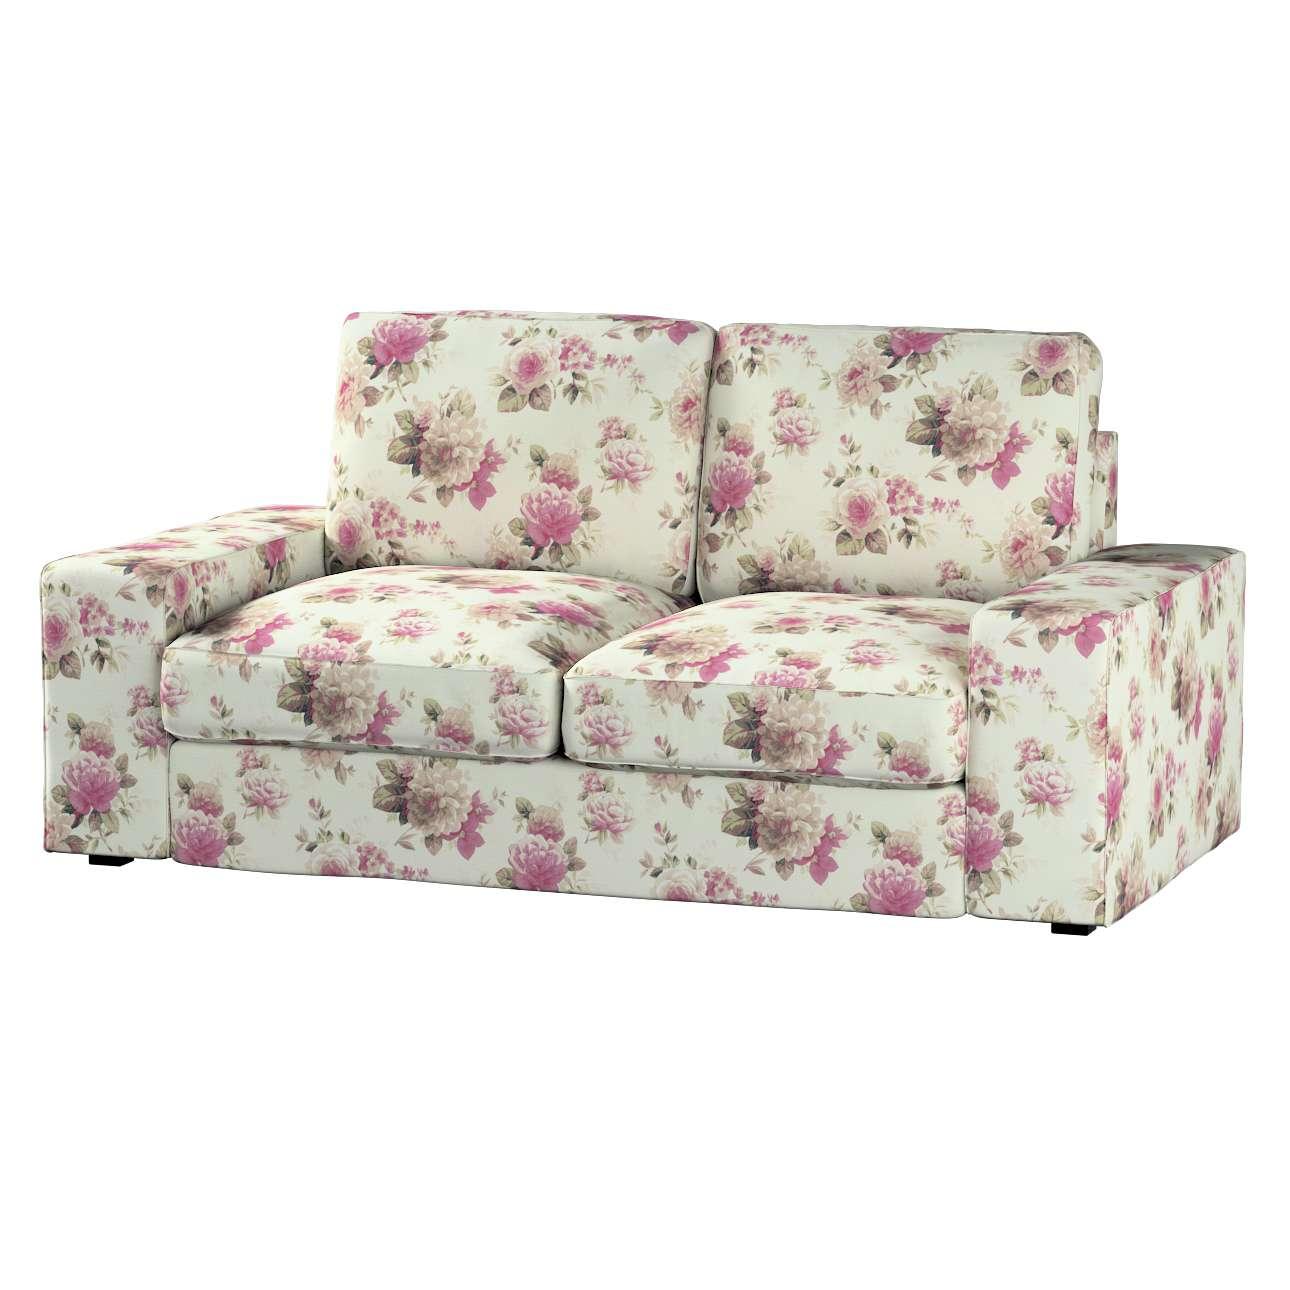 Kivik 2-Sitzer Sofabezug Sofa Kivik 2-Sitzer von der Kollektion Mirella, Stoff: 141-07